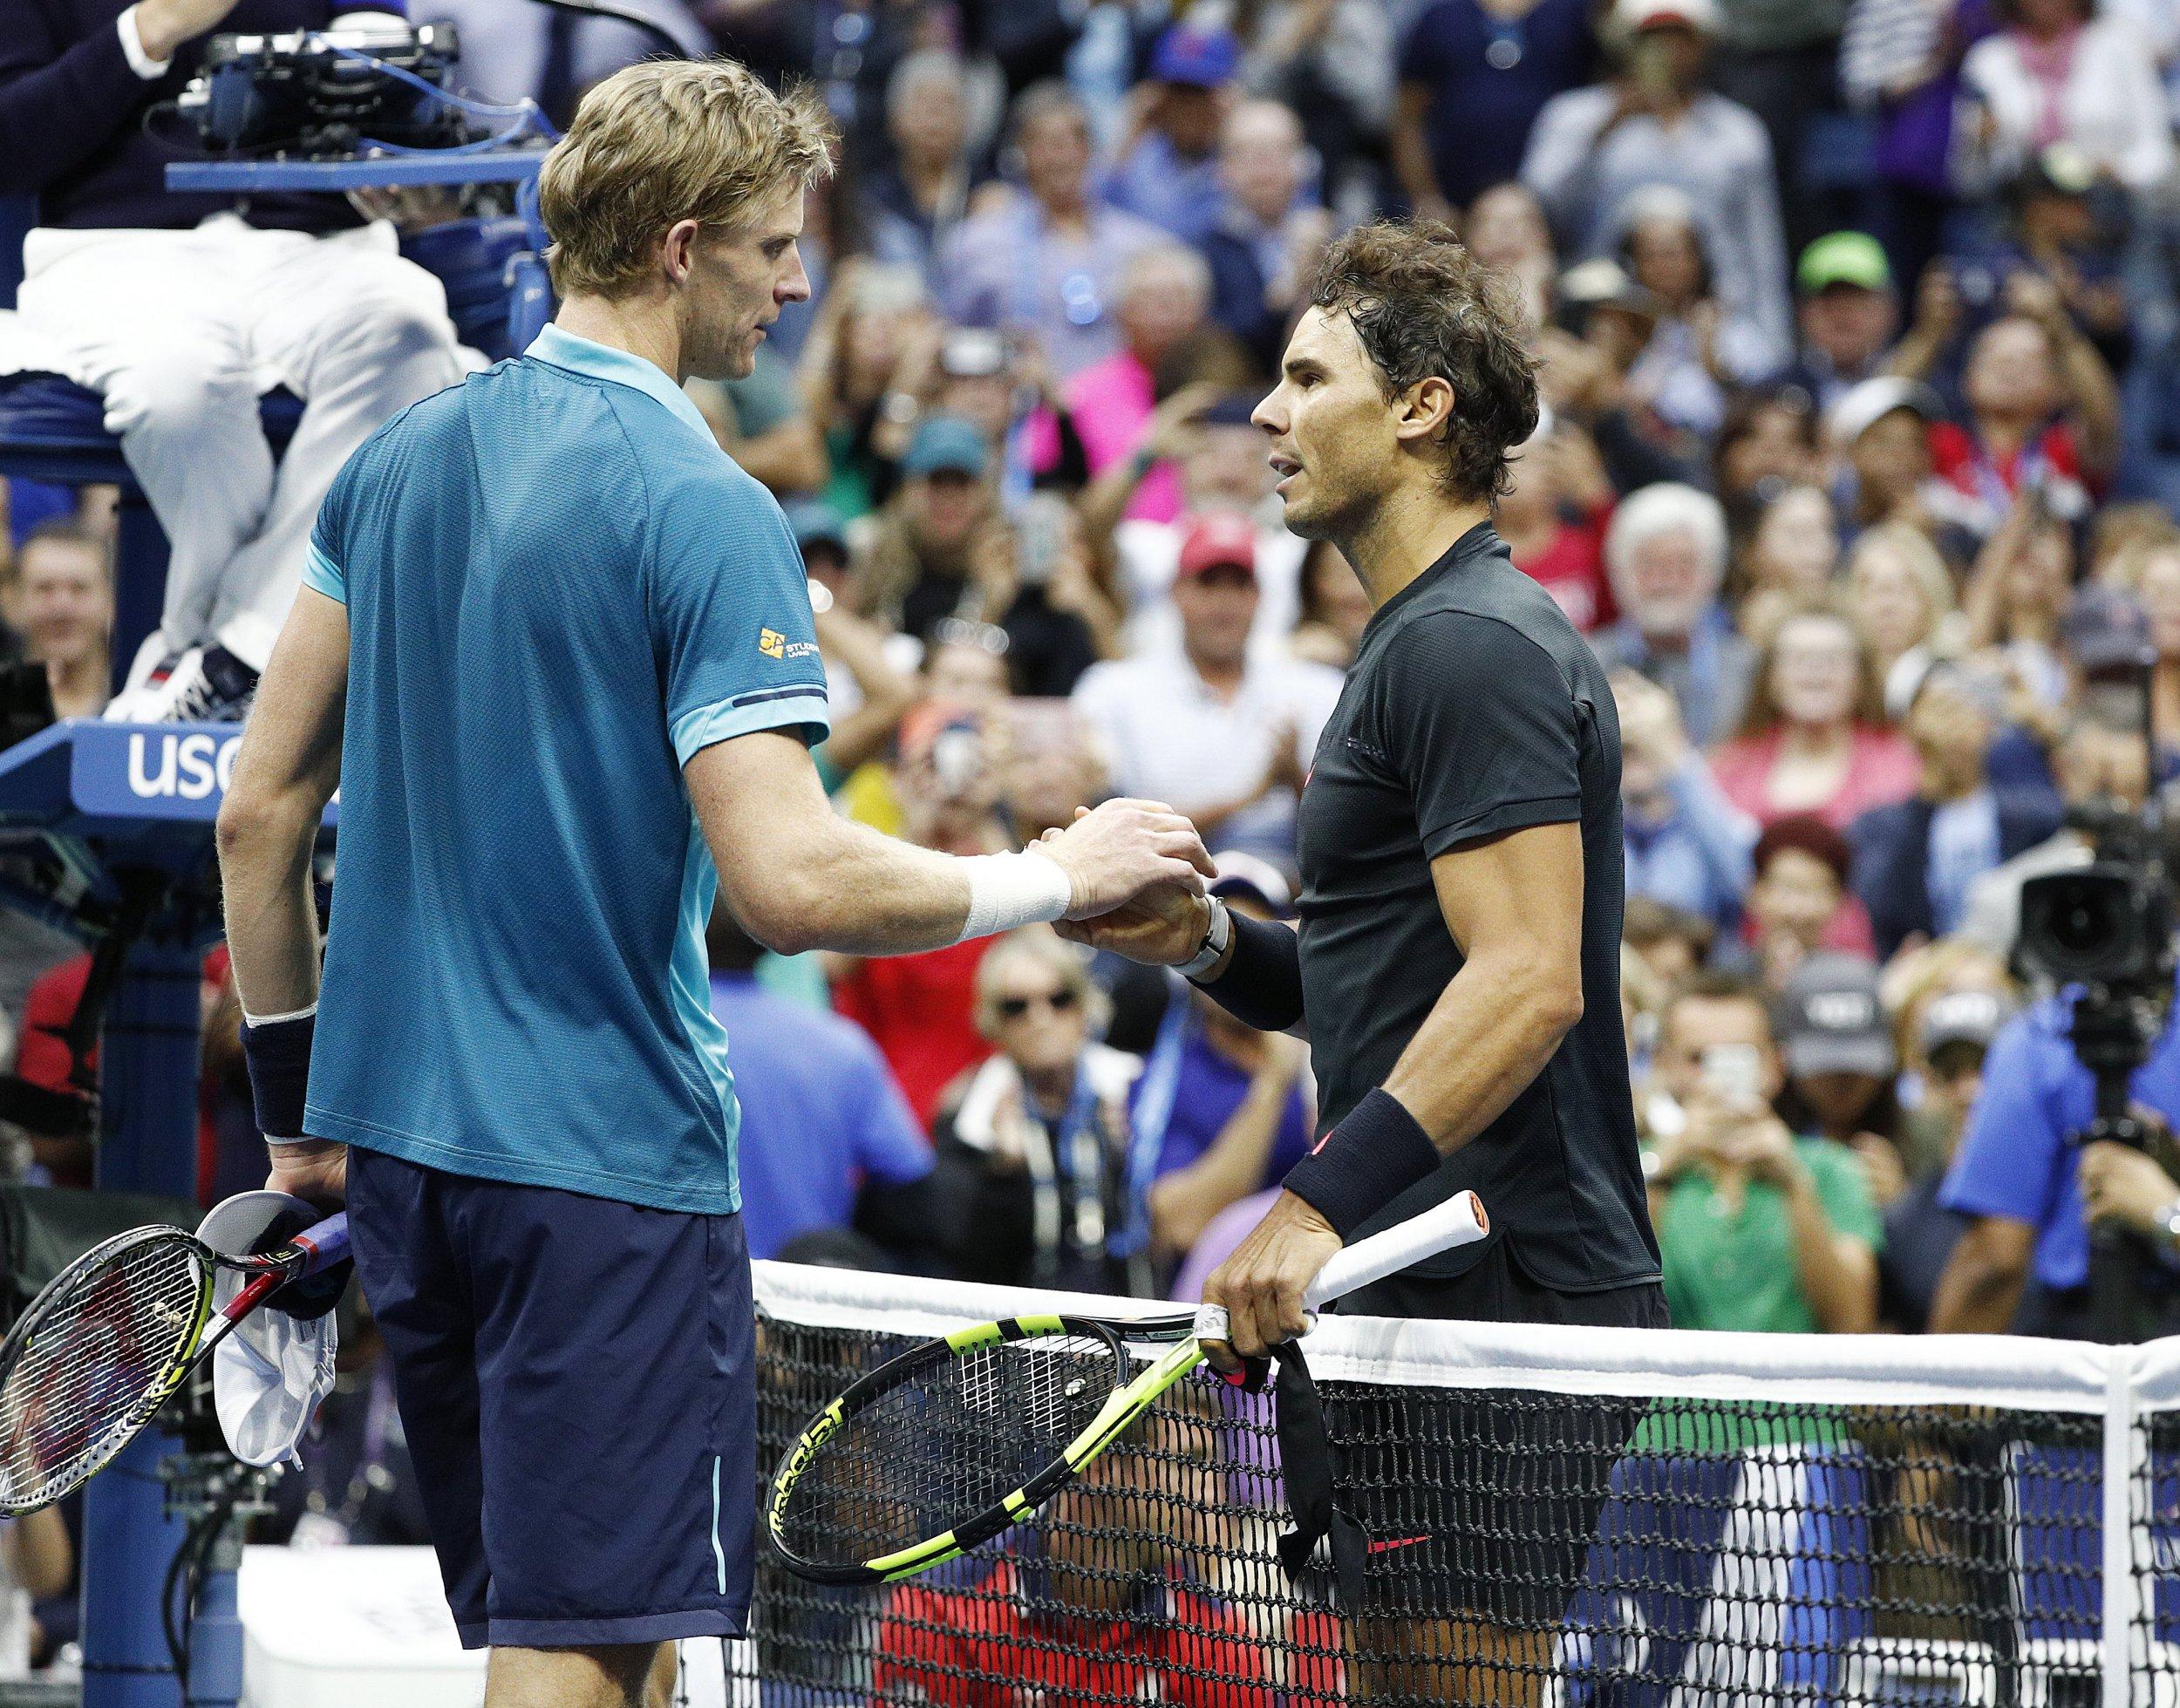 US Open finalist Kevin Anderson previews 2018 as Novak Djokovic & Andy Murray return to battle Rafael Nadal & Roger Federer